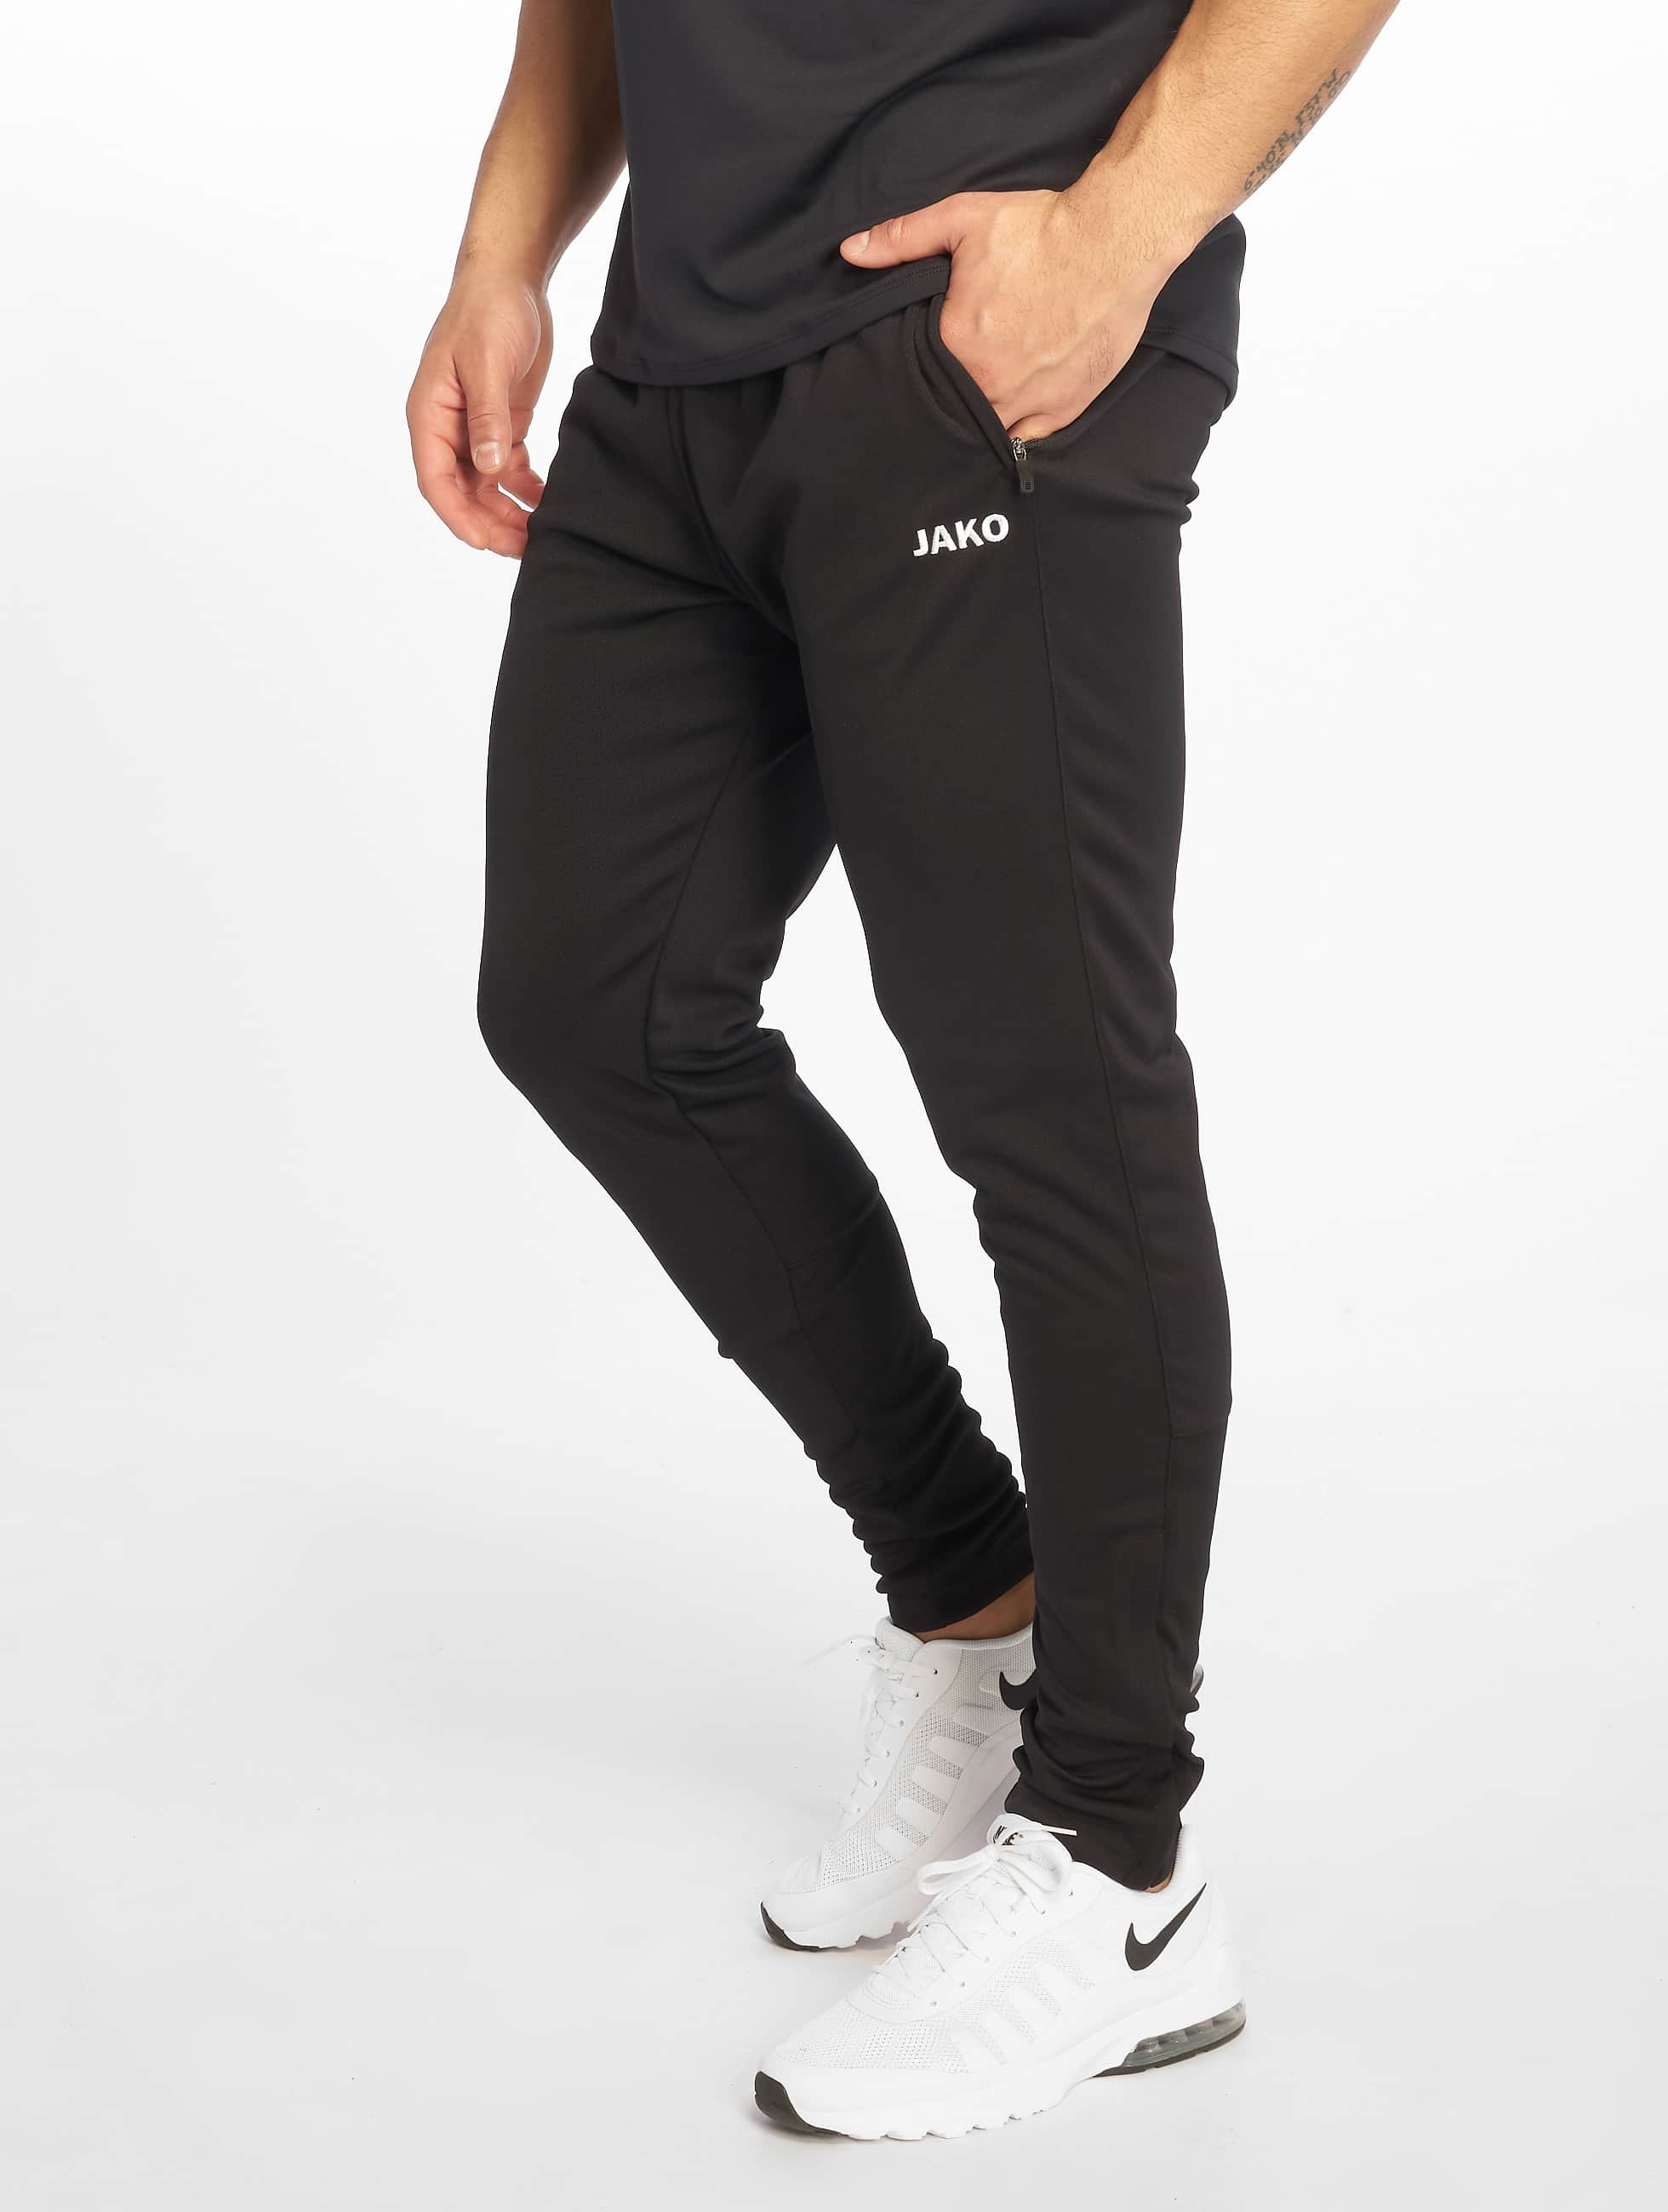 Jako Classico Training Pants Black